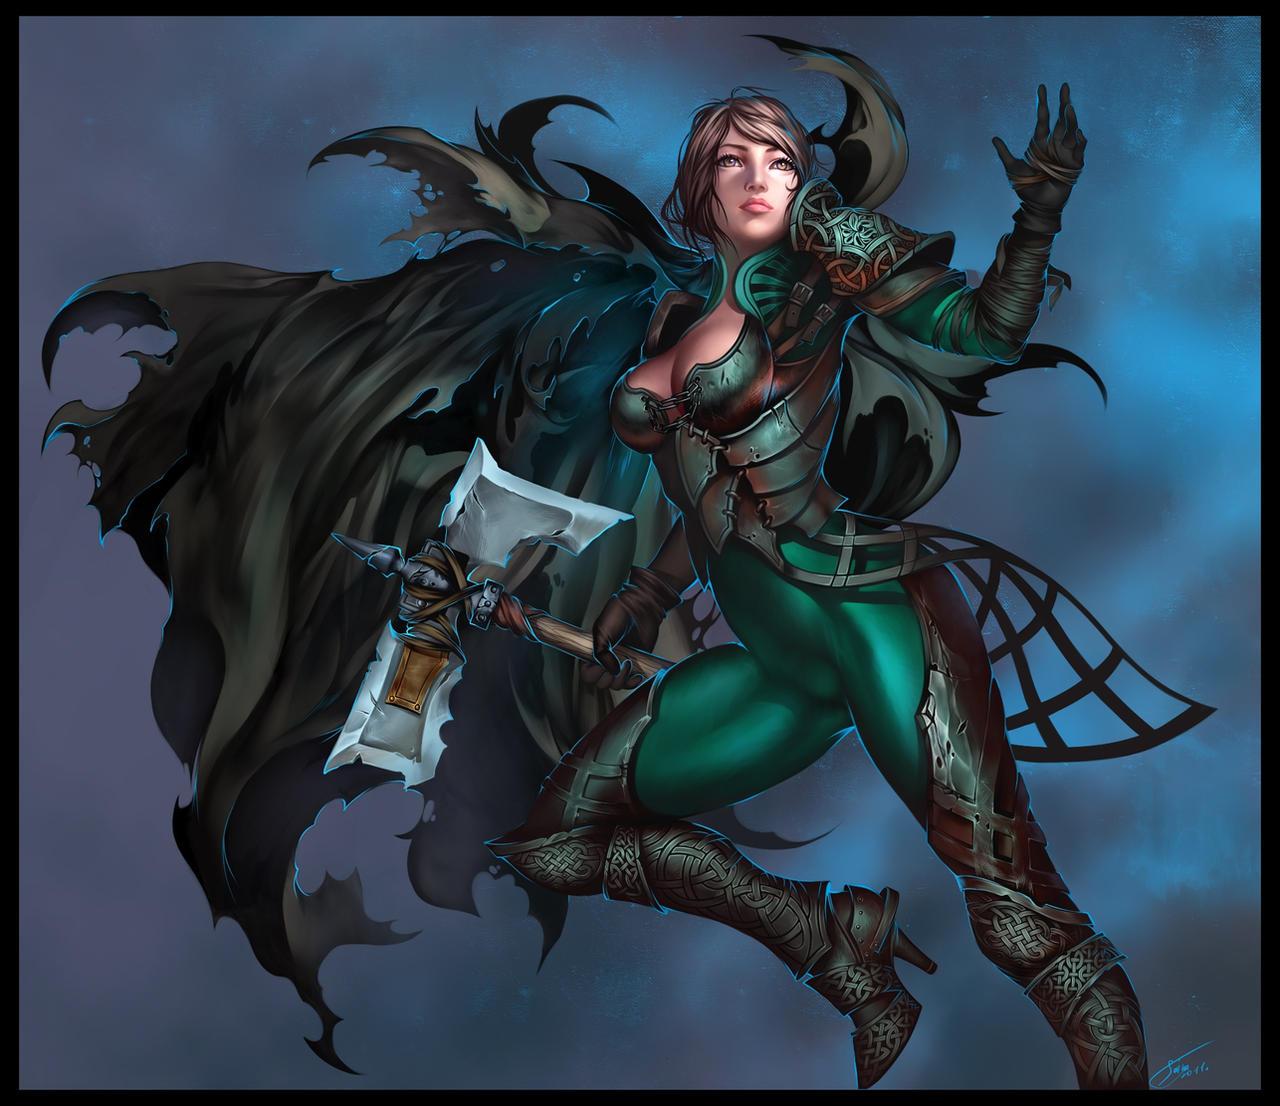 Wallpaper Most Stylish Women Warriors In Digital Arts: Celtic Warrior By Sinto-risky On DeviantArt